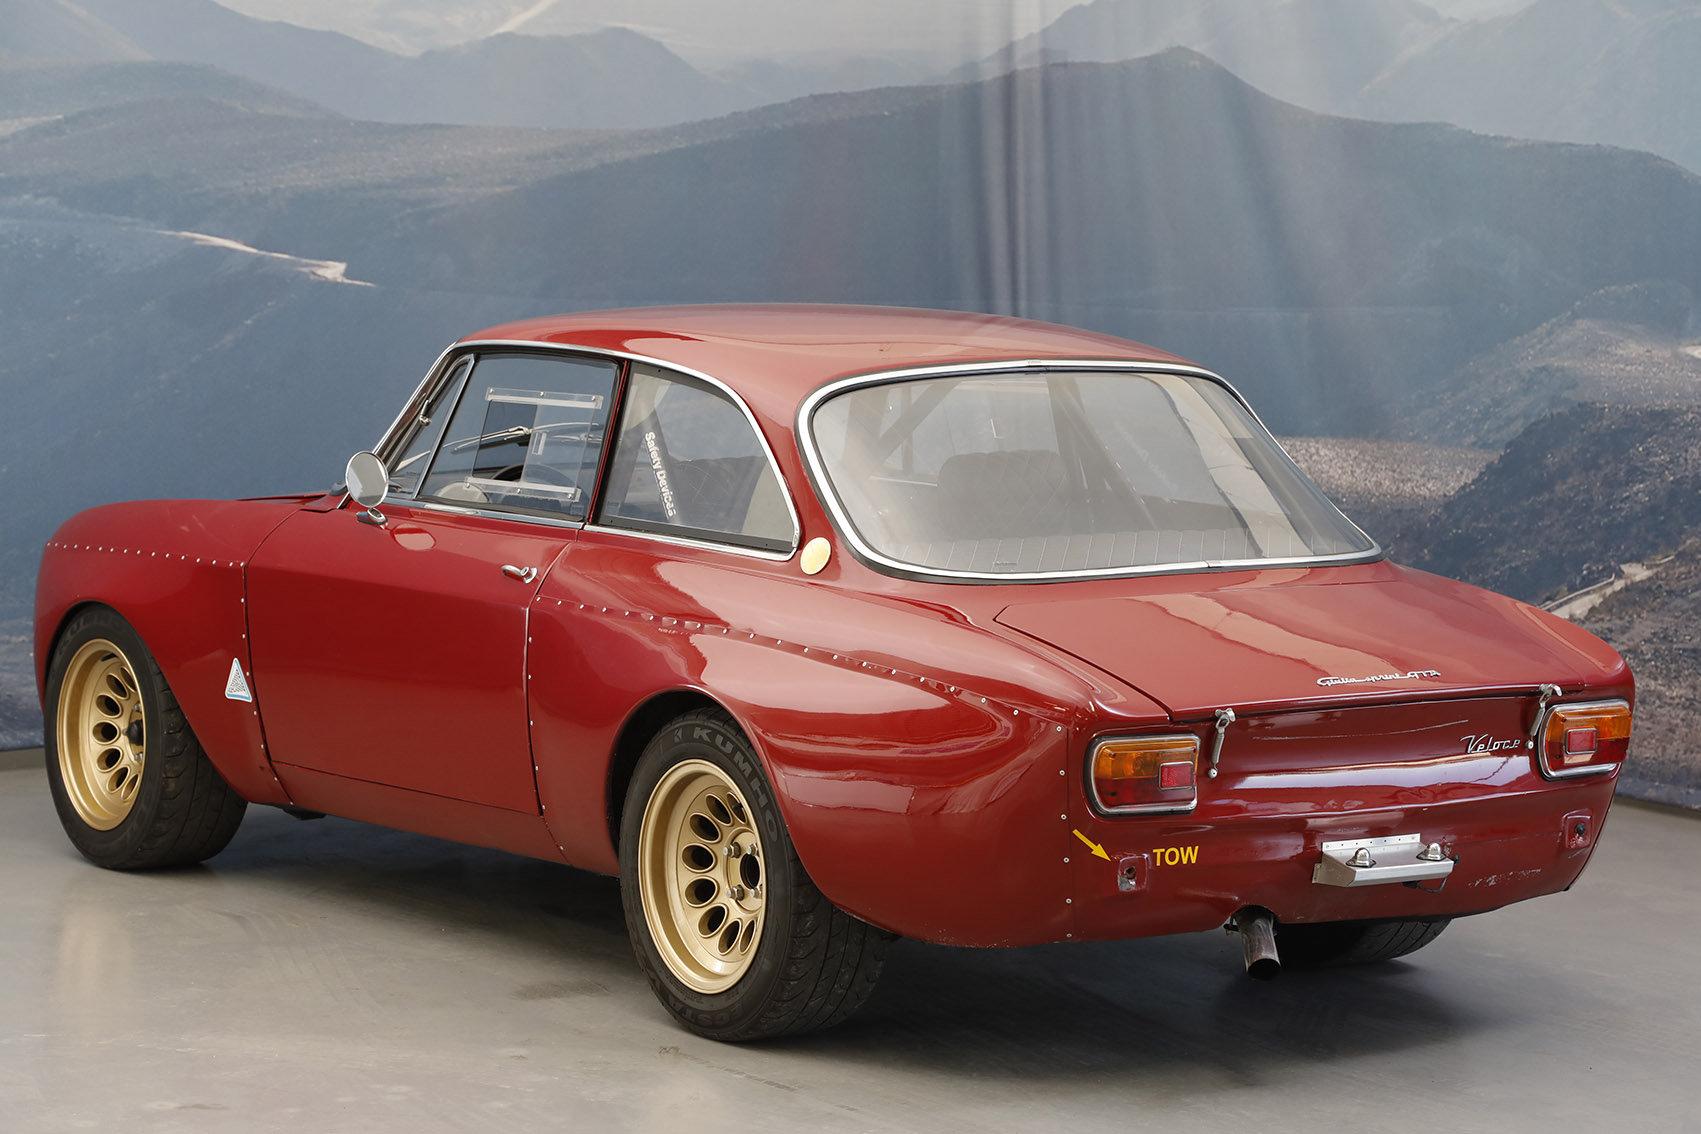 1967 Alfa Romeo 1600 GT Veloce  For Sale (picture 2 of 6)